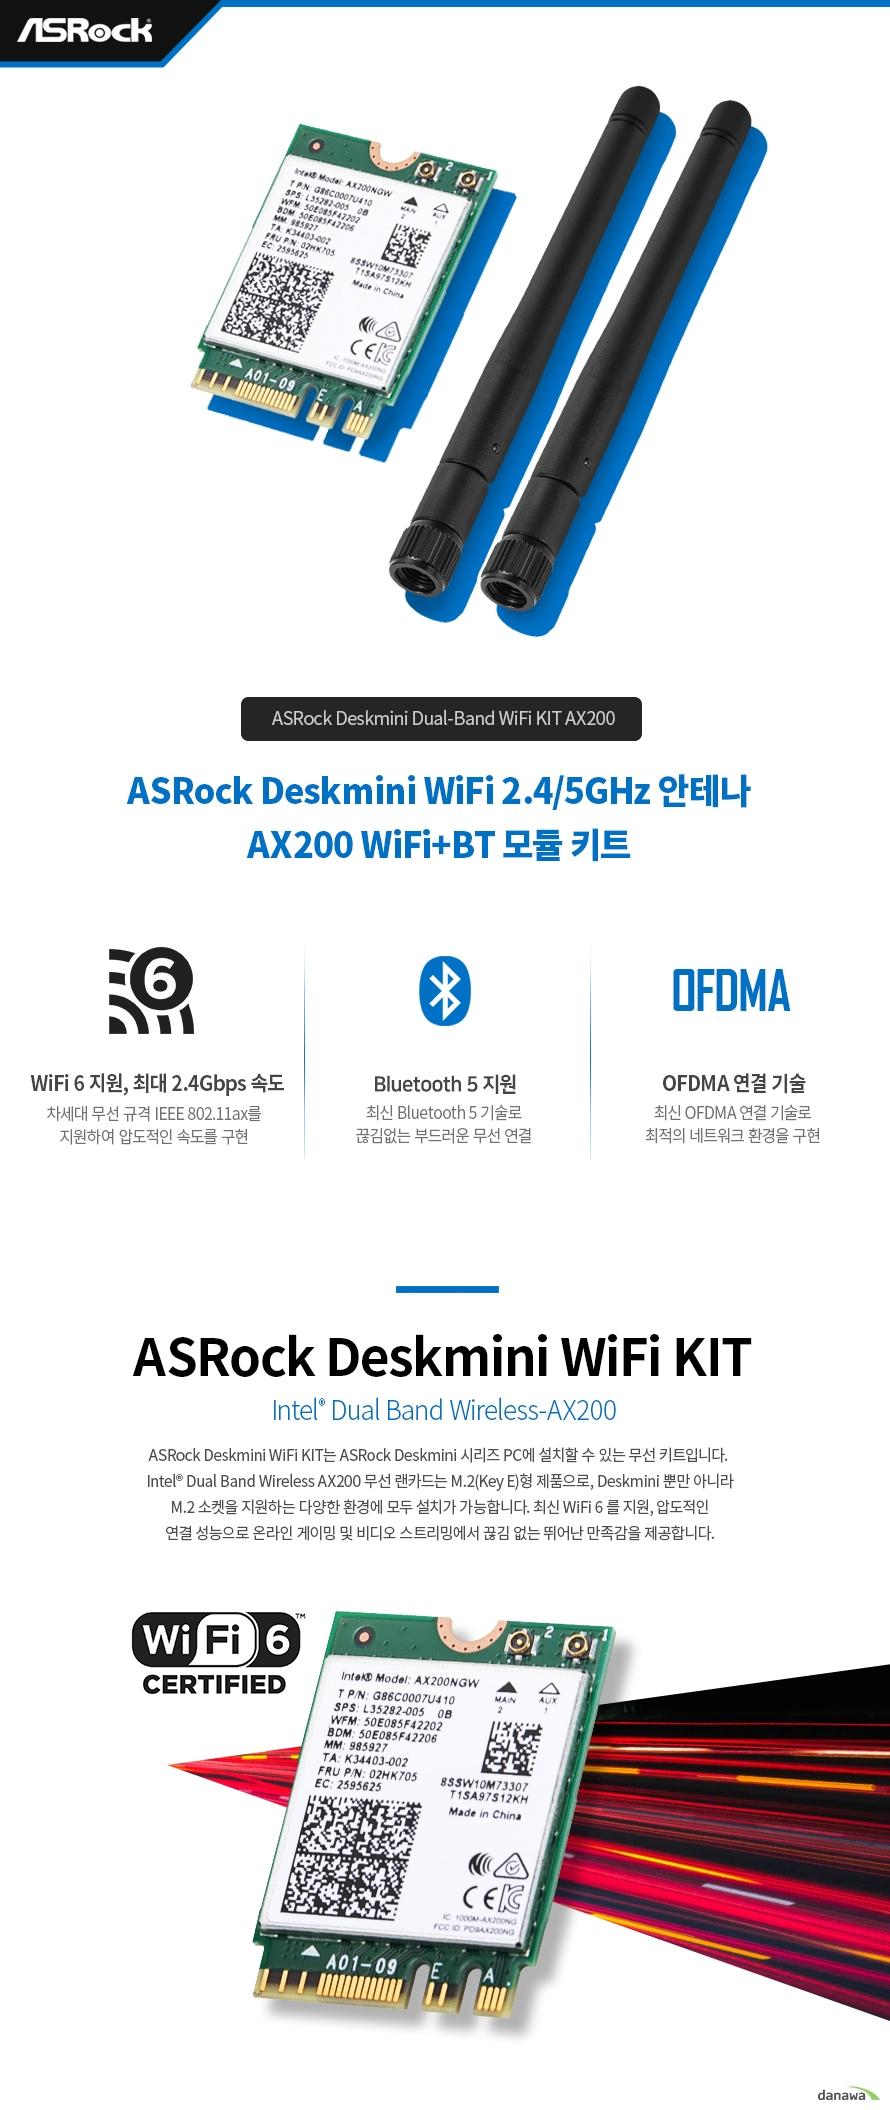 ASRock Deskmini WiFi KIT AX200  제품 상세 정보  제품명 인텔 듀얼밴드 와이어리스 AX200 폼팩터 m.2 2230규격 제품 중량 2.8그램 동작 온도 0도에서 80도 지원 os 리눅스 구글 크롬 os 및 윈도우 10 64비트 2x2 안테나 지원 2.4 GHZ 및 5GHZ 듀얼밴드 지원 최대 2.4 GBPS 속도 지원 802.11AX 규격 지원 블루투스 5.0 지원 MU MIMO 지원 KC 인증 번호 r c int ax200ngw 1년 무상 서비스 지원